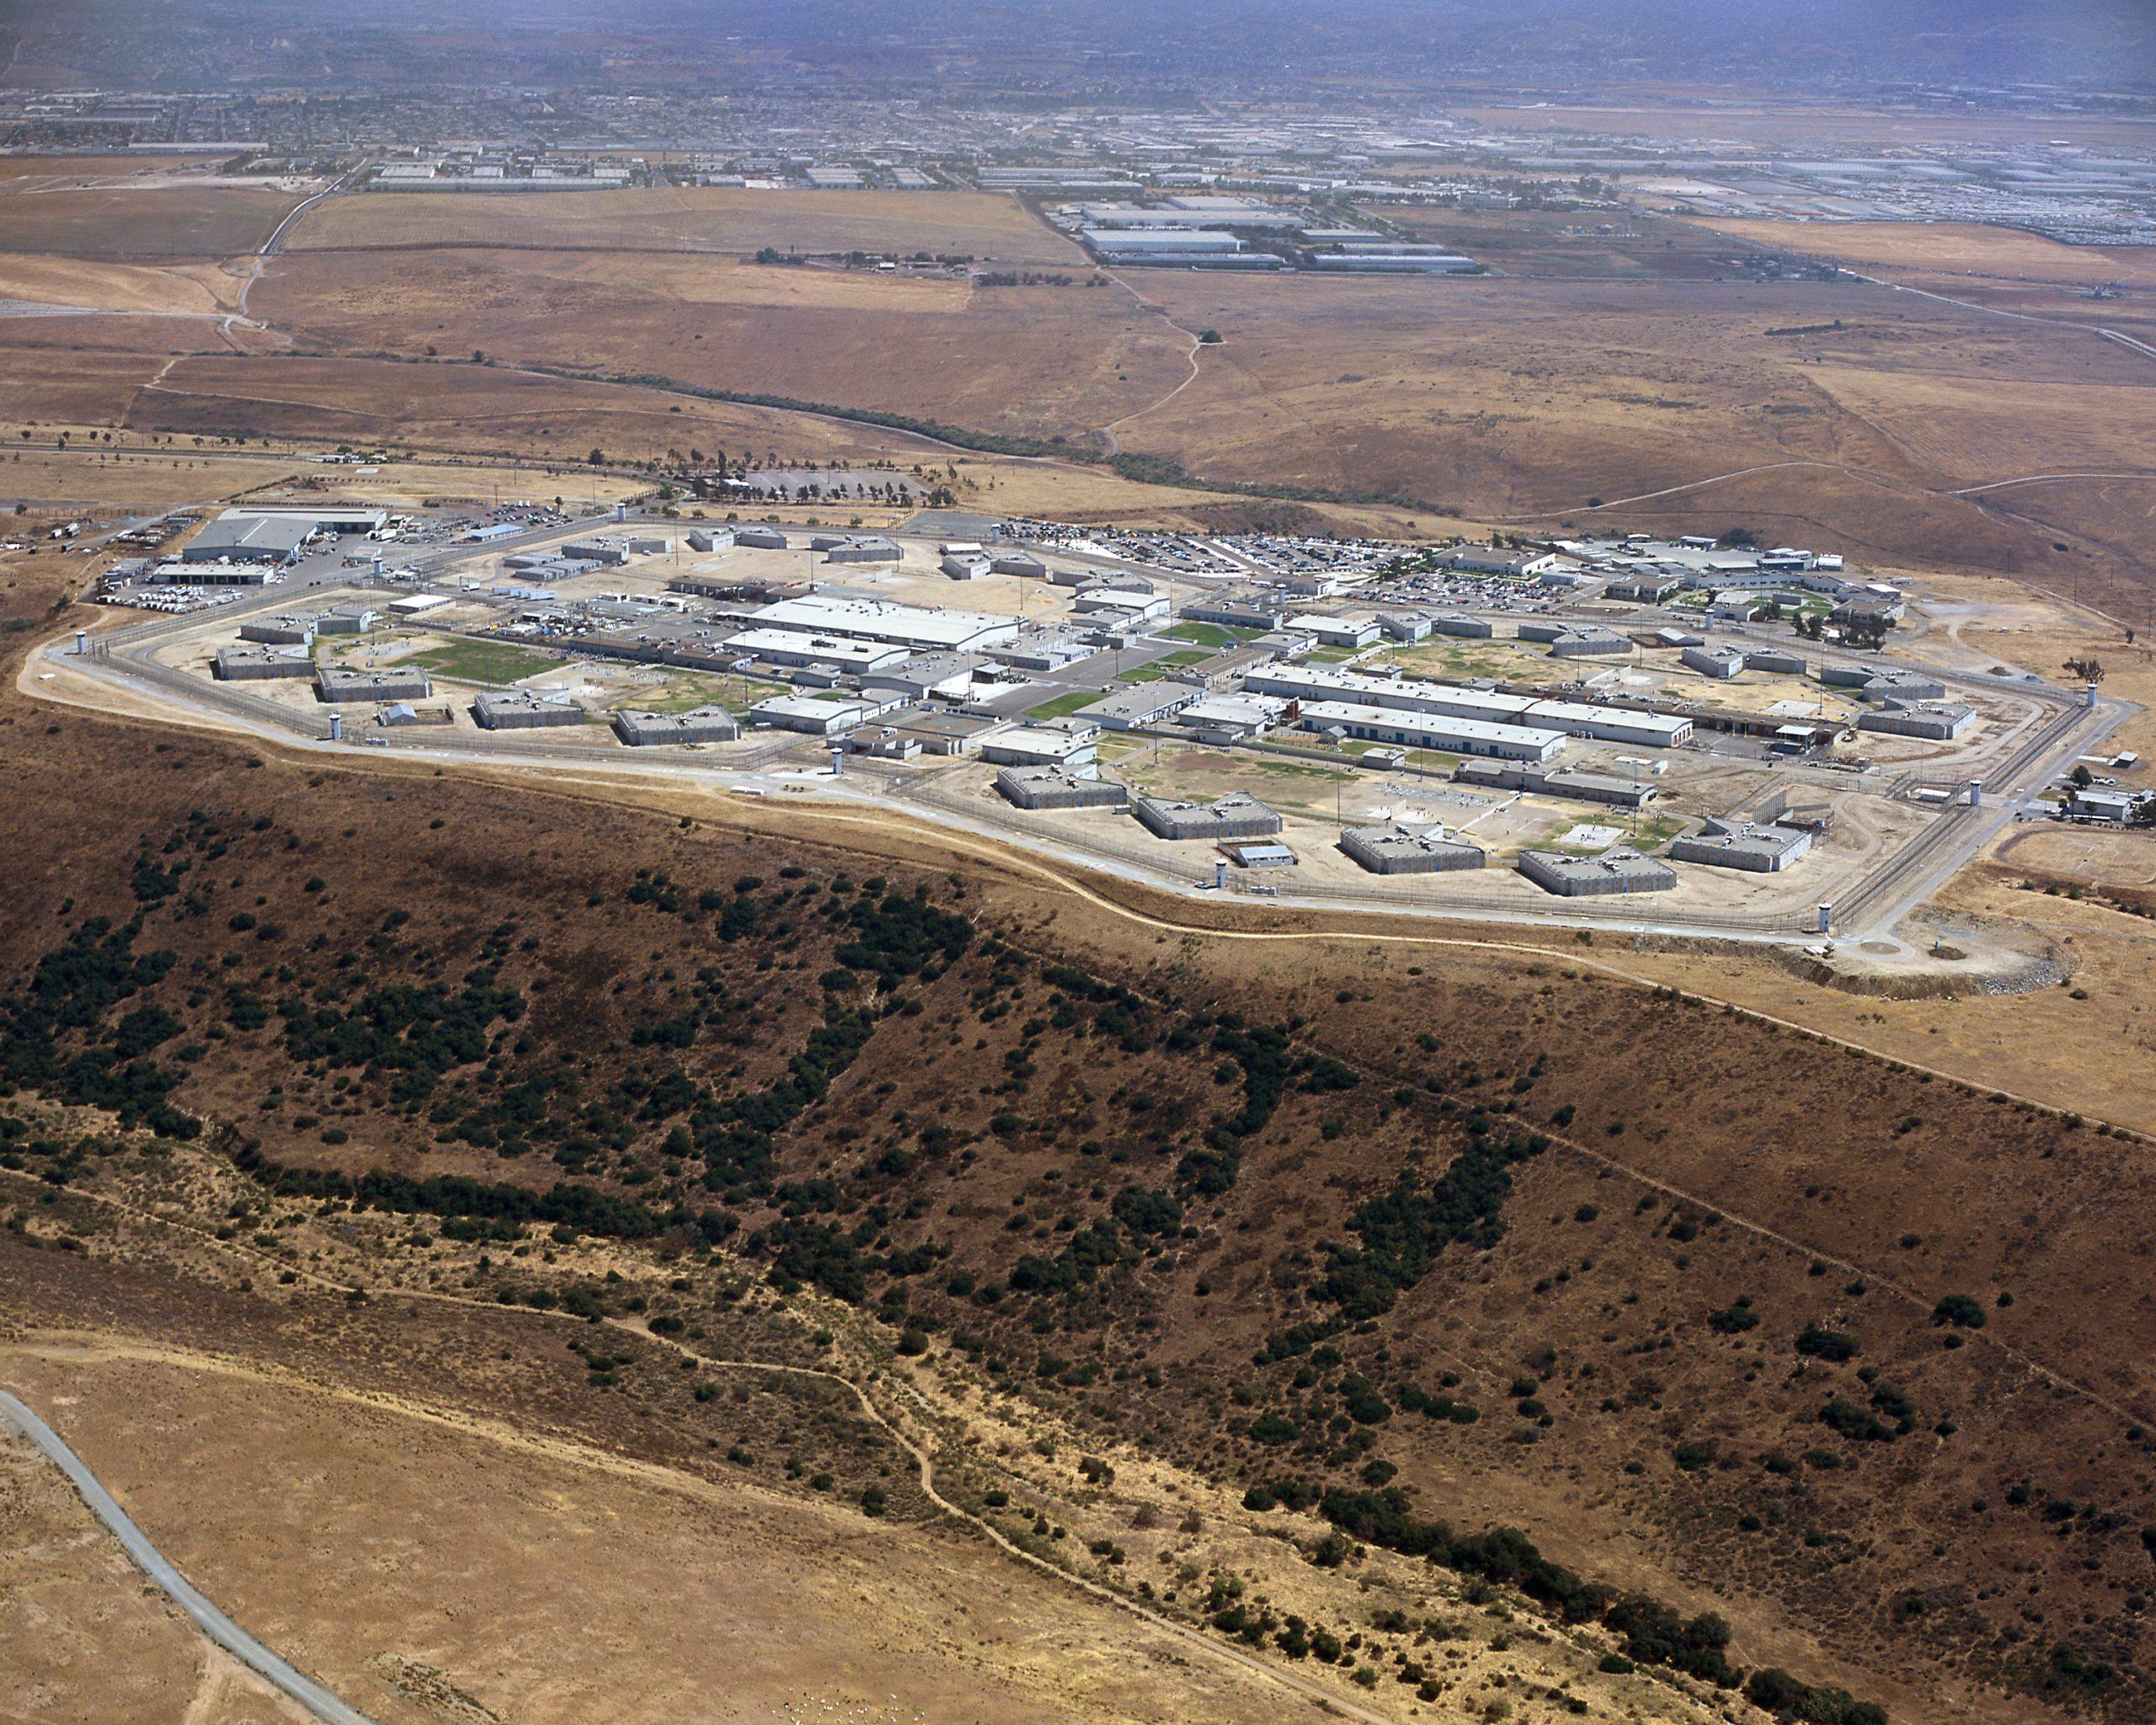 Richard J. Donovan Correctional Facility aerial view.